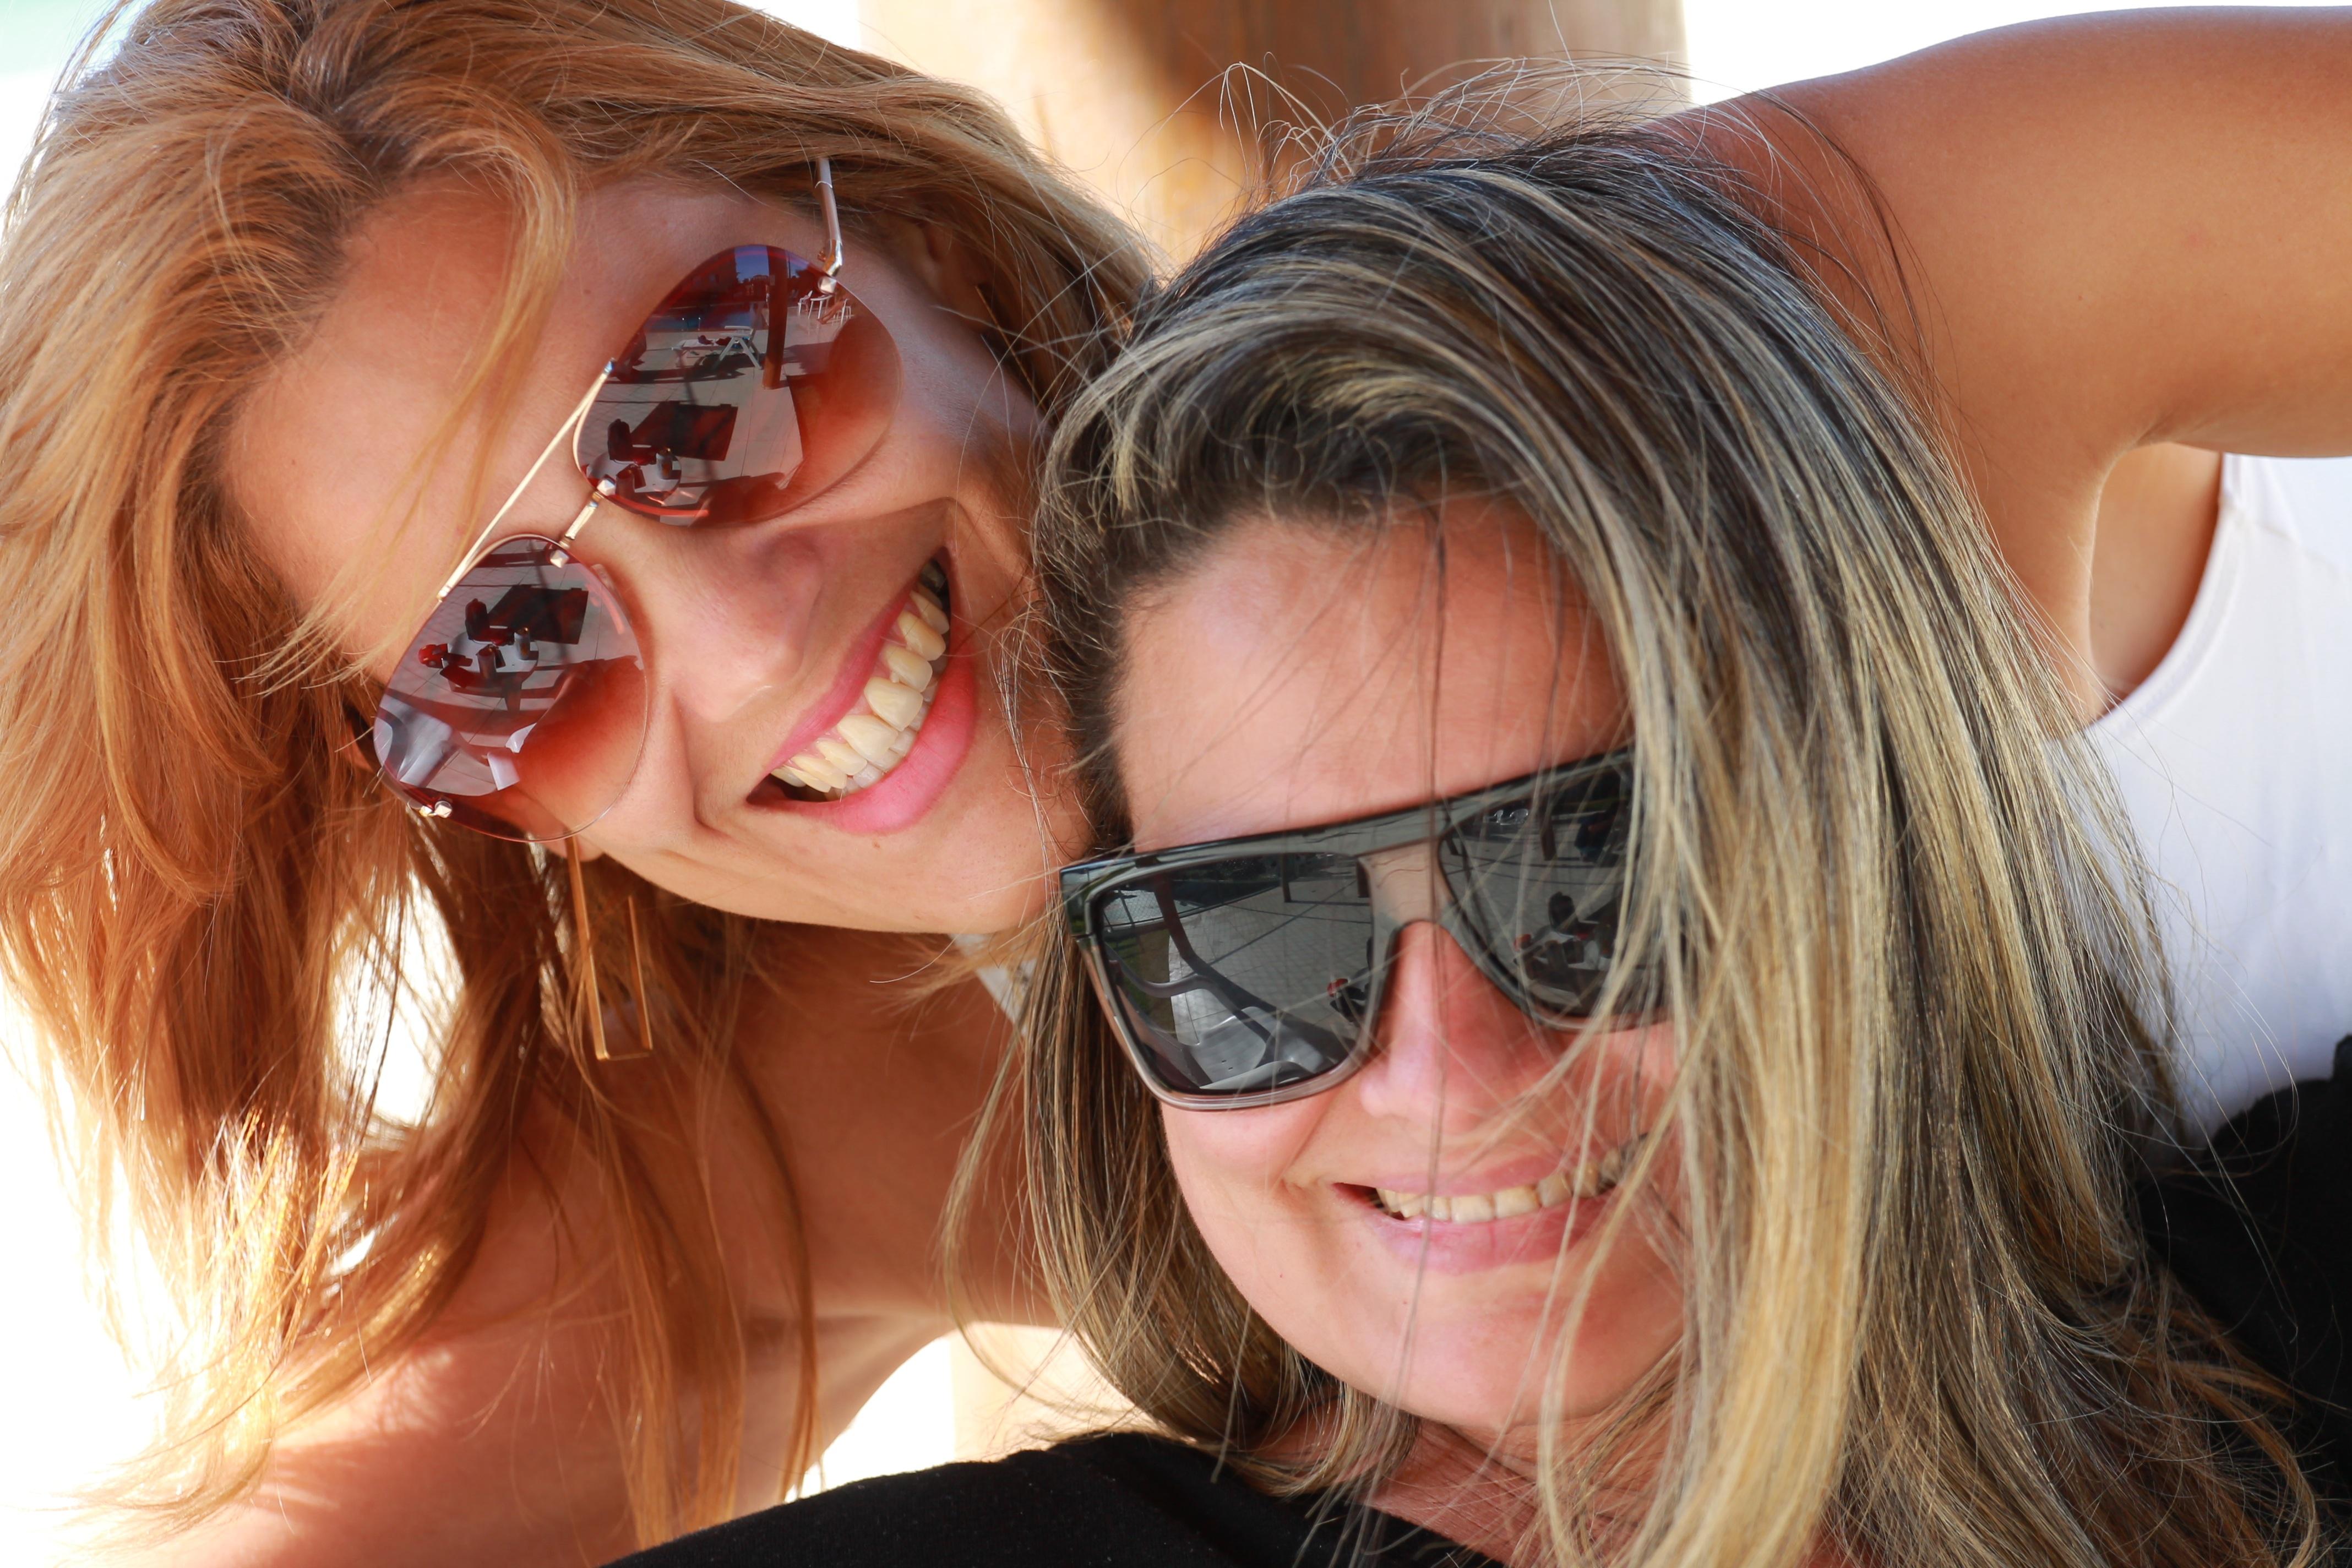 Braune haare selfie hübsche frau Hübsche Jungs